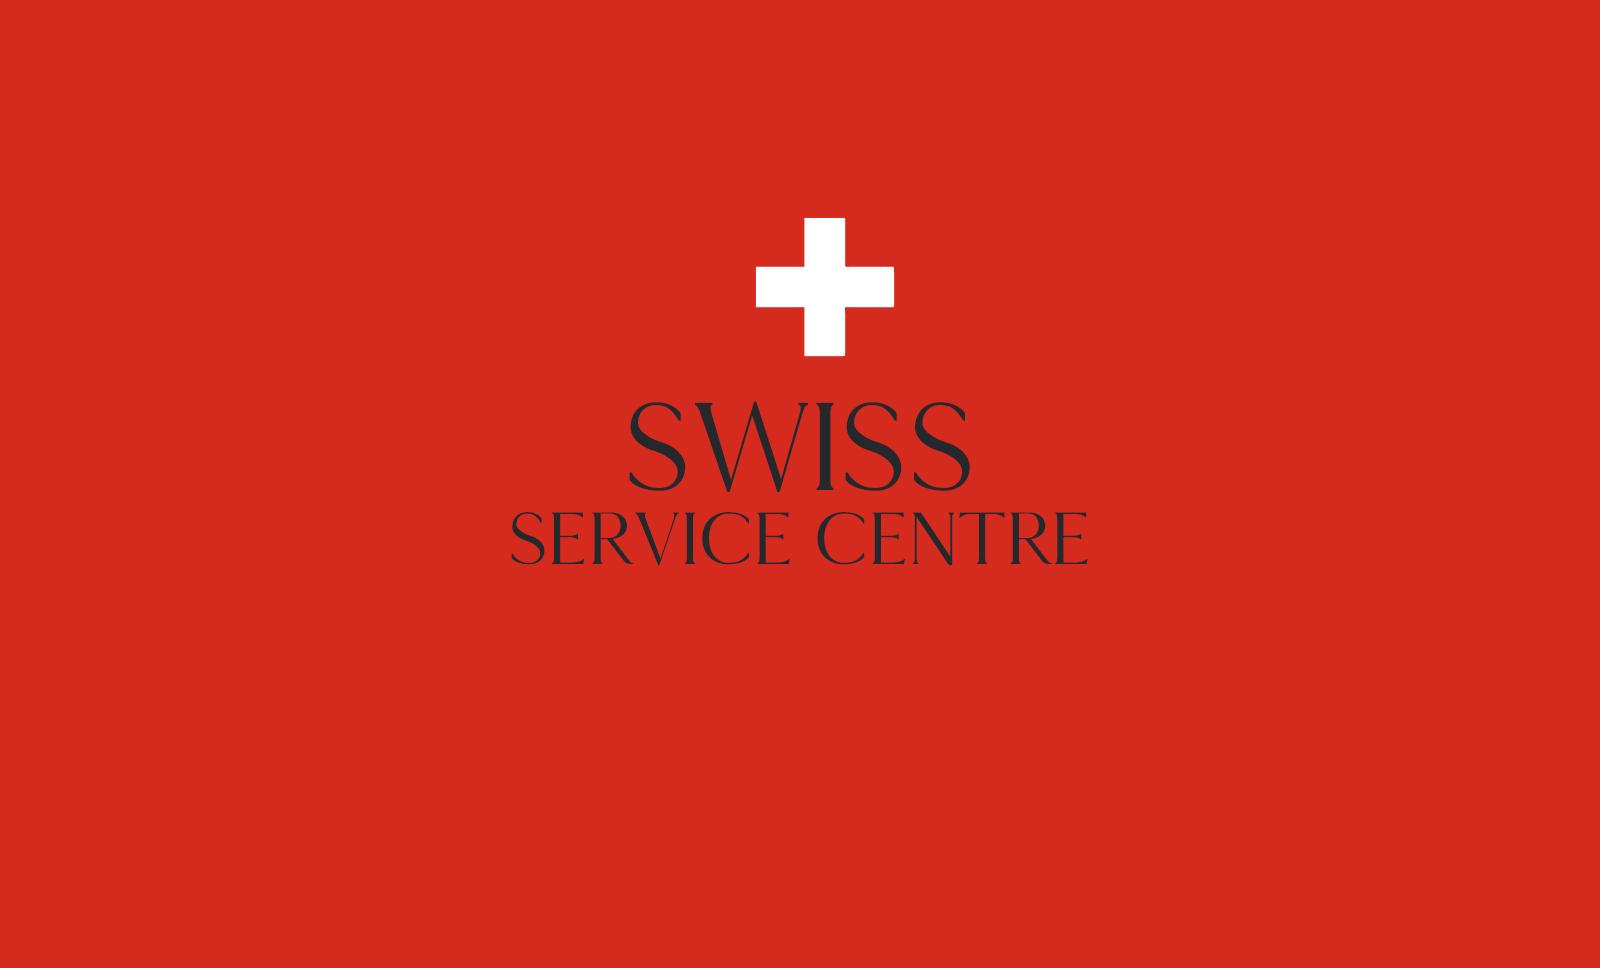 Swiss Service Centre